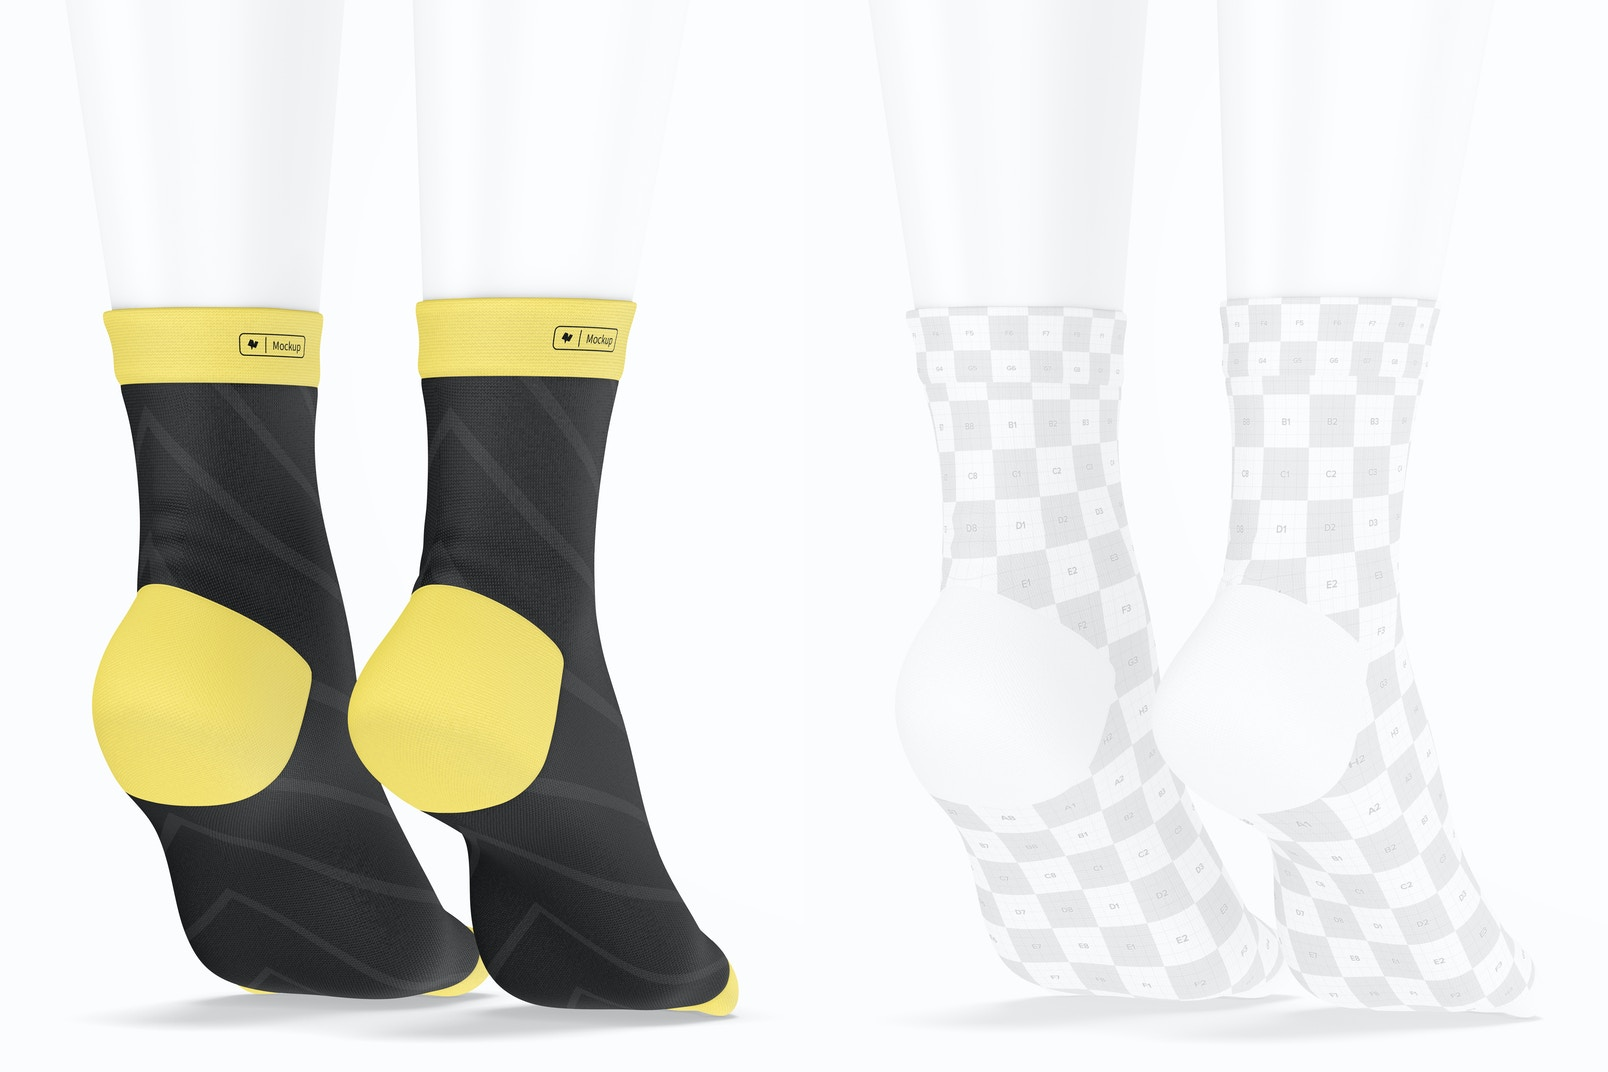 Sports Cycling Socks Mockup